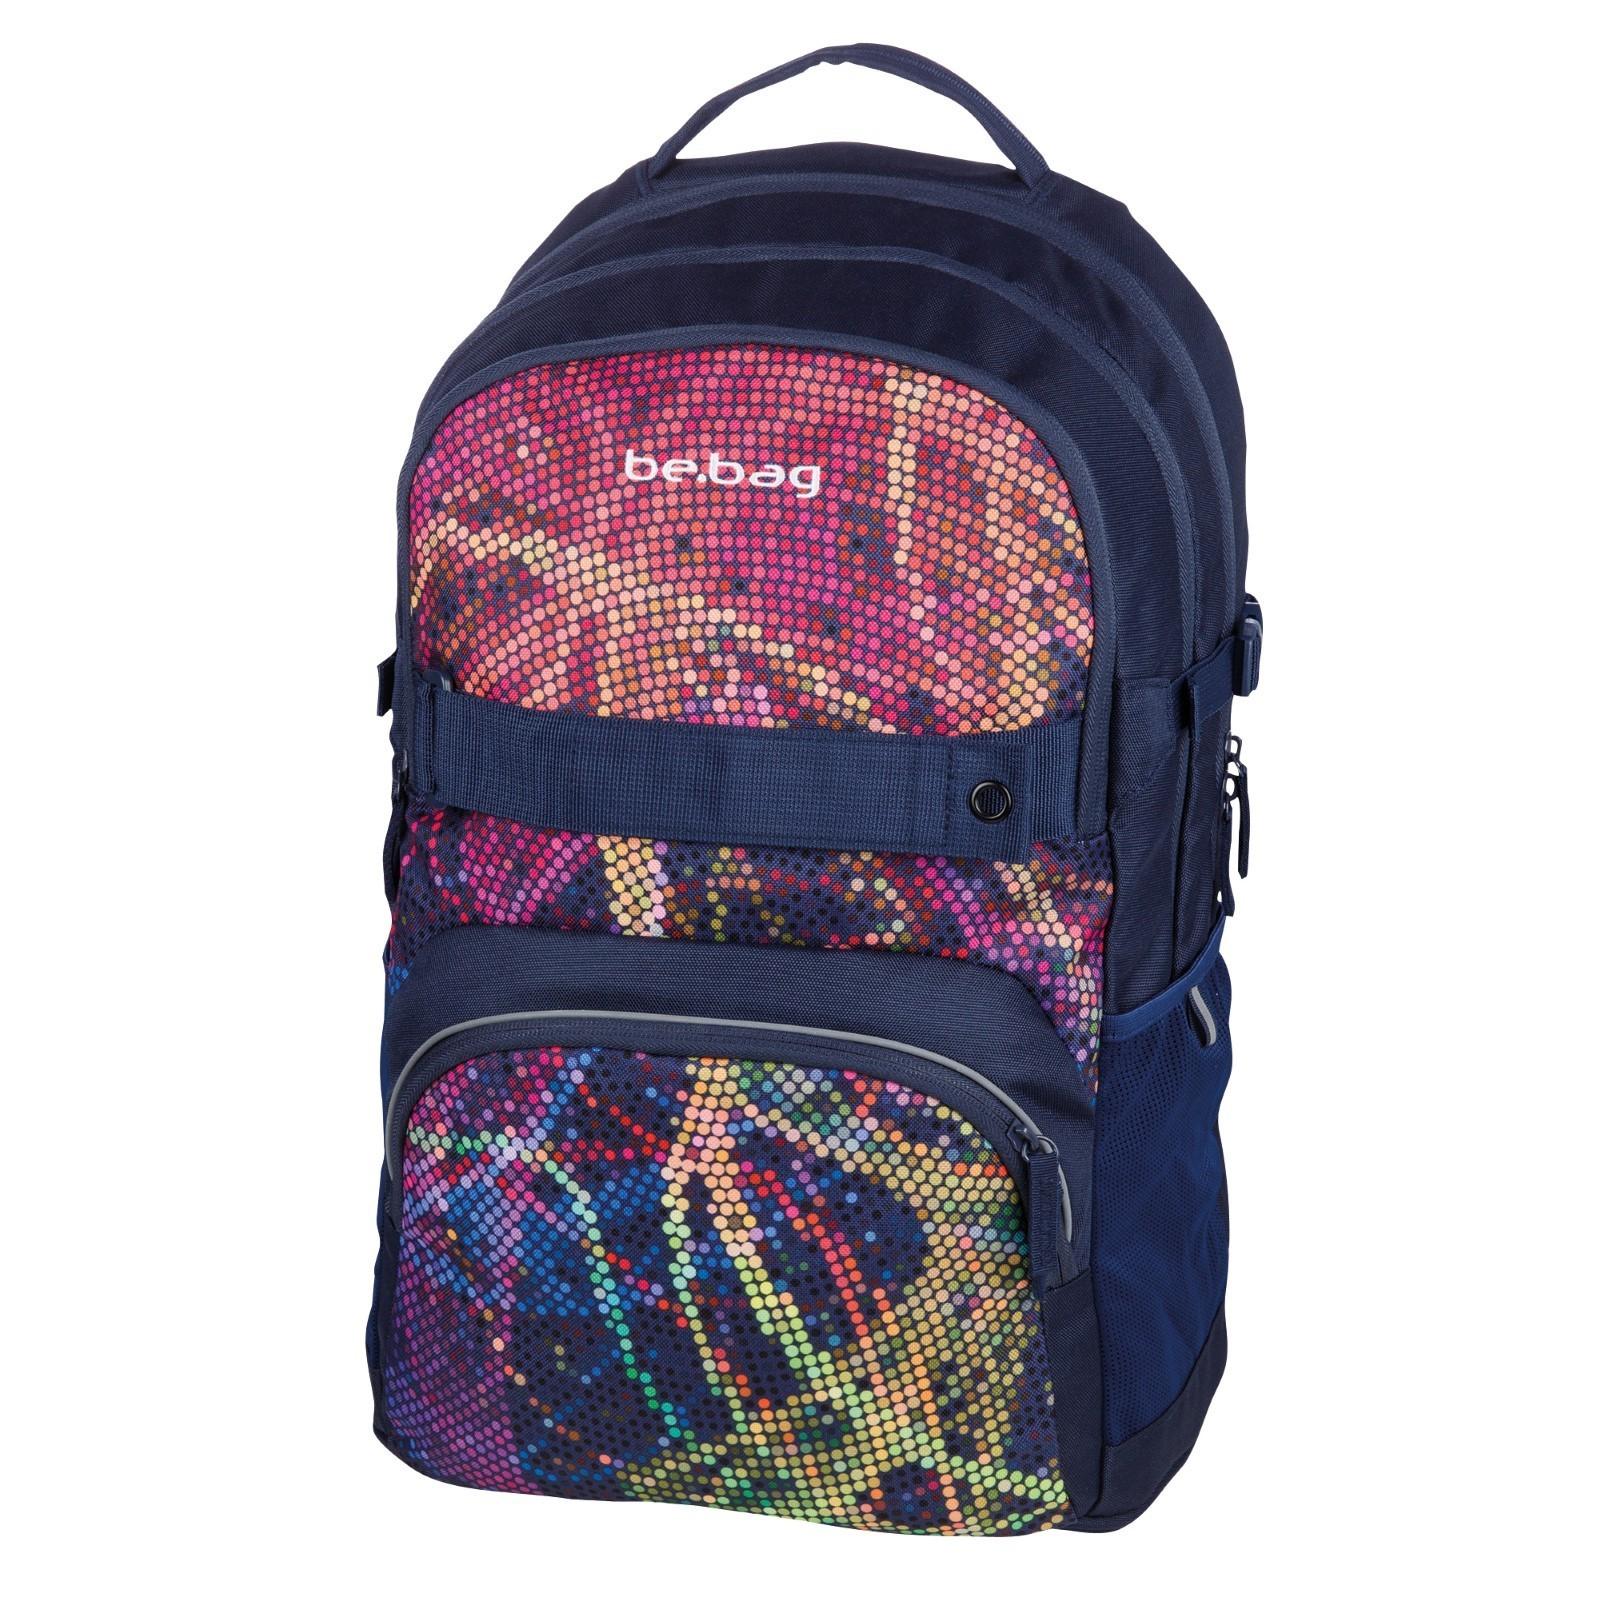 3eed7b4beb489 Plecaki szkolne Herlitz (be.bag) majtaniej - Herlitz Smart - plecak ...